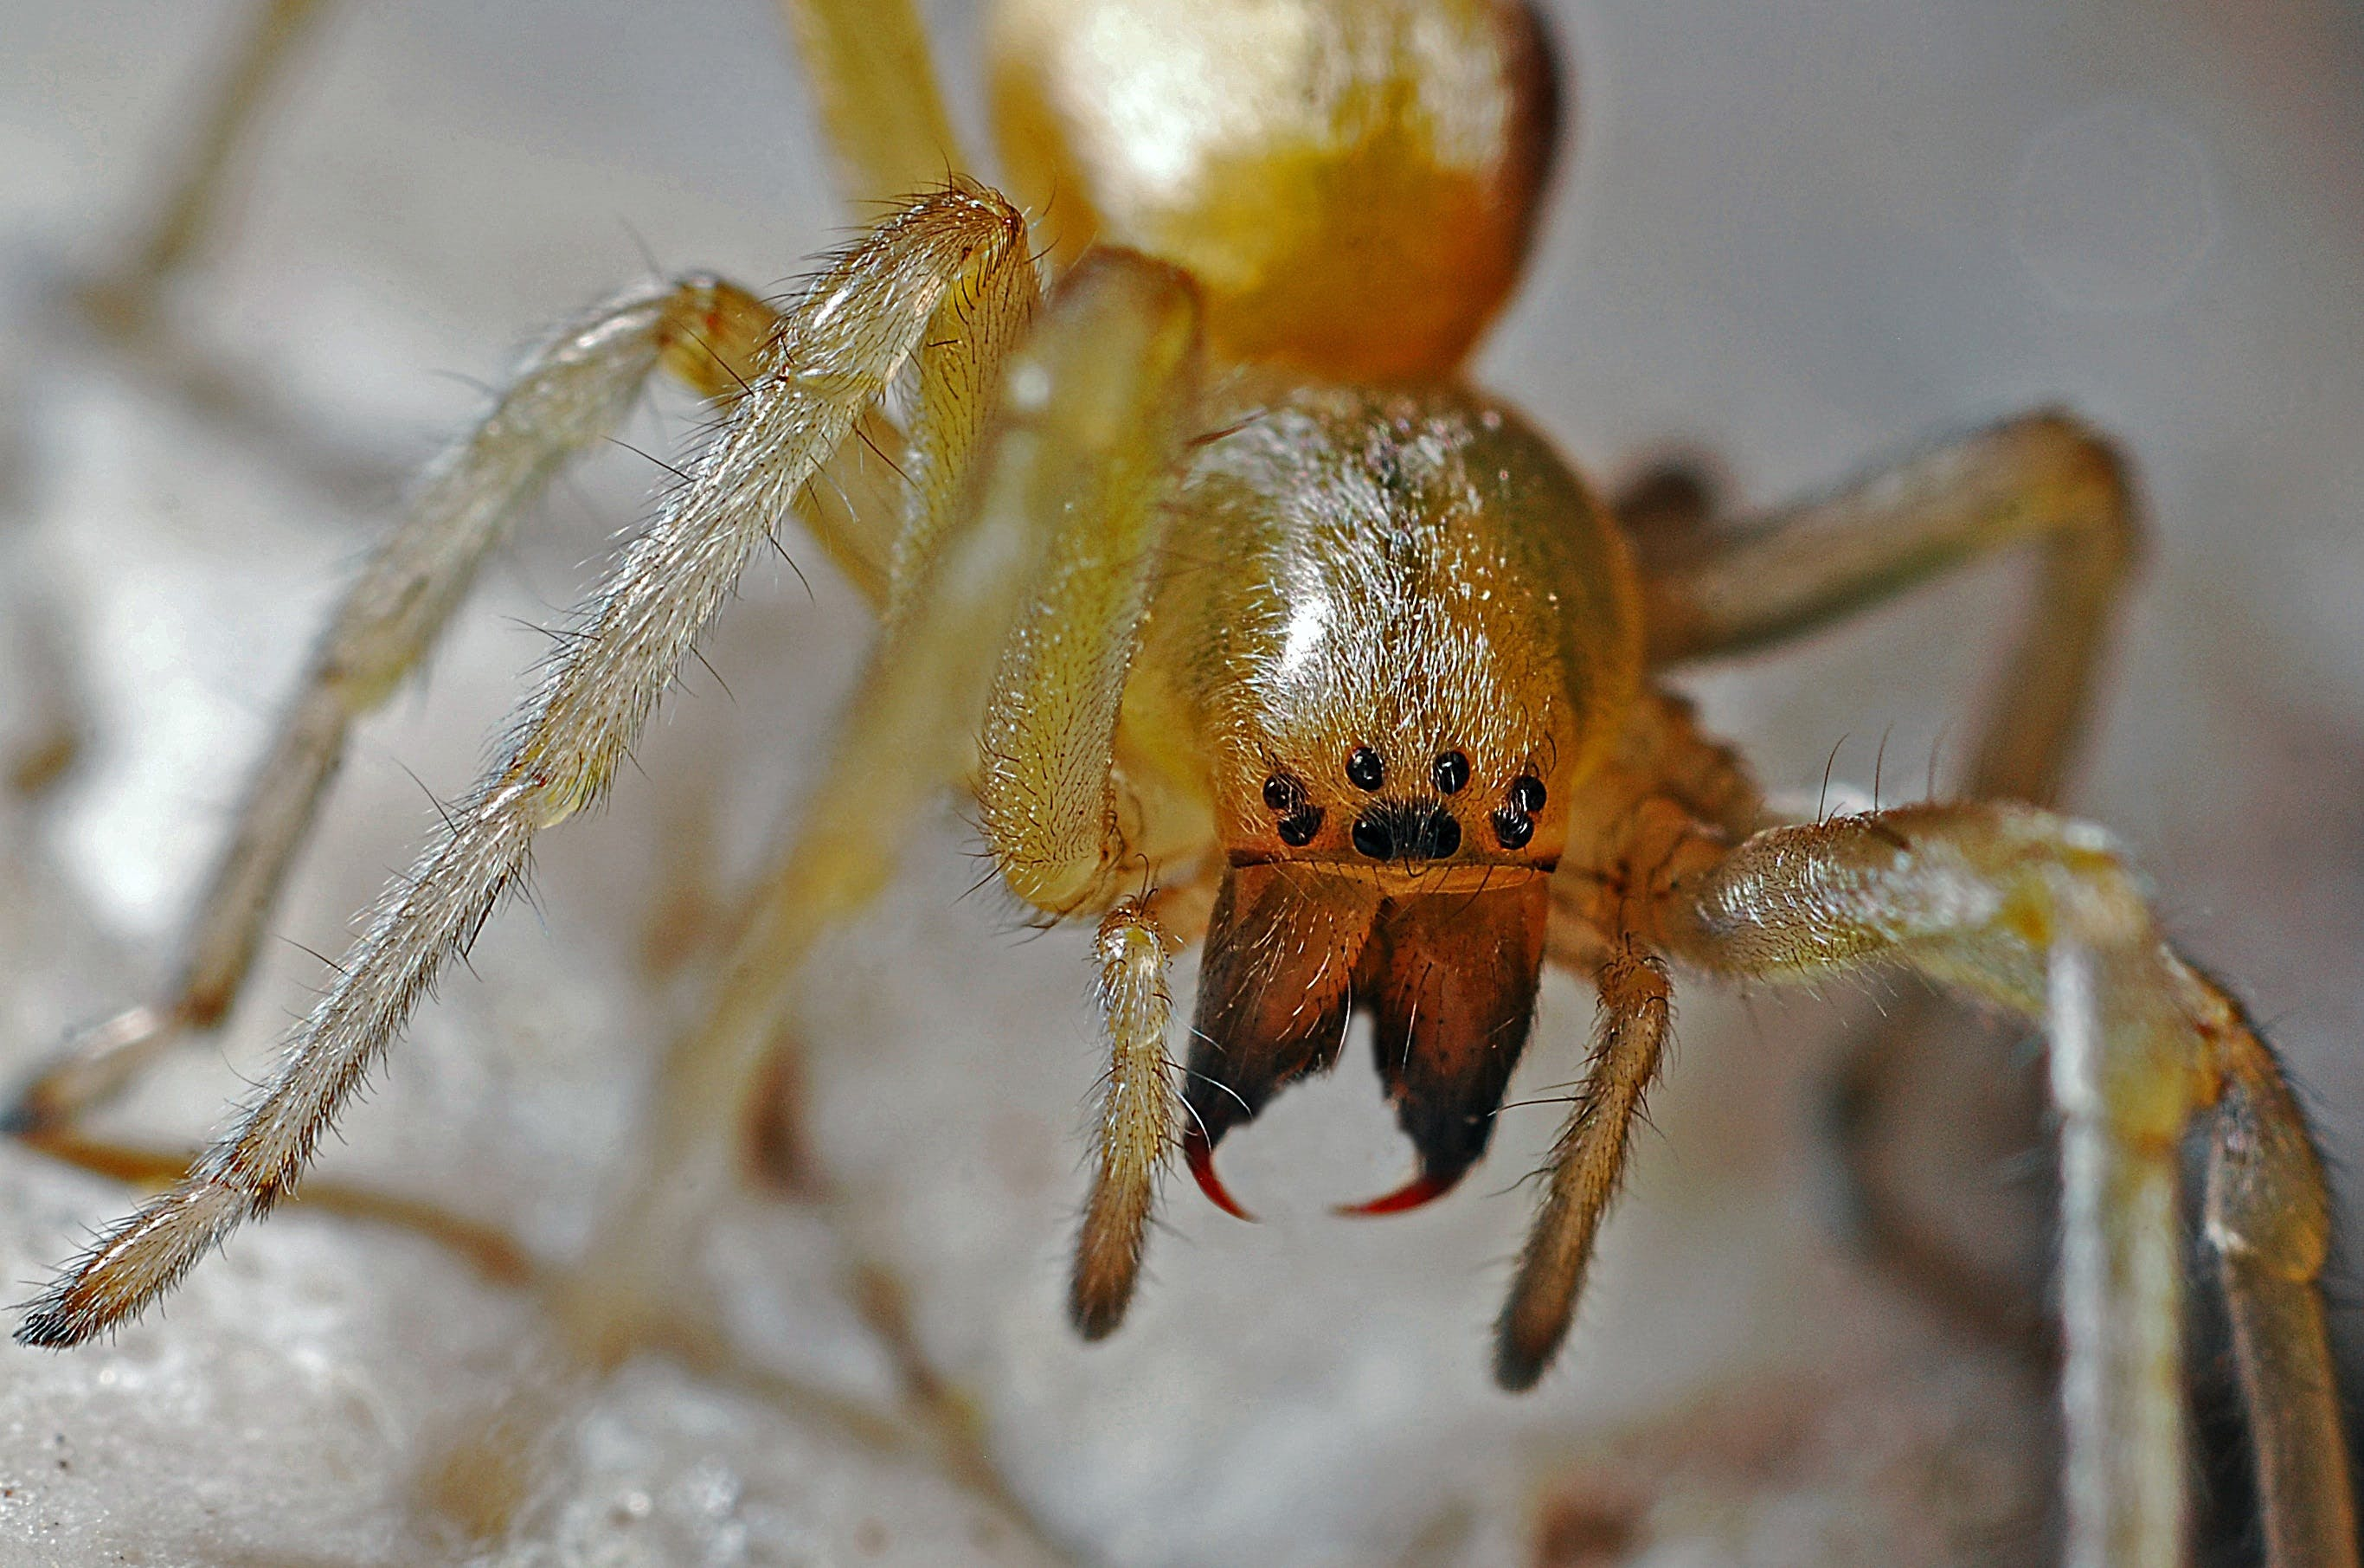 Yellow 8 Legged Spider